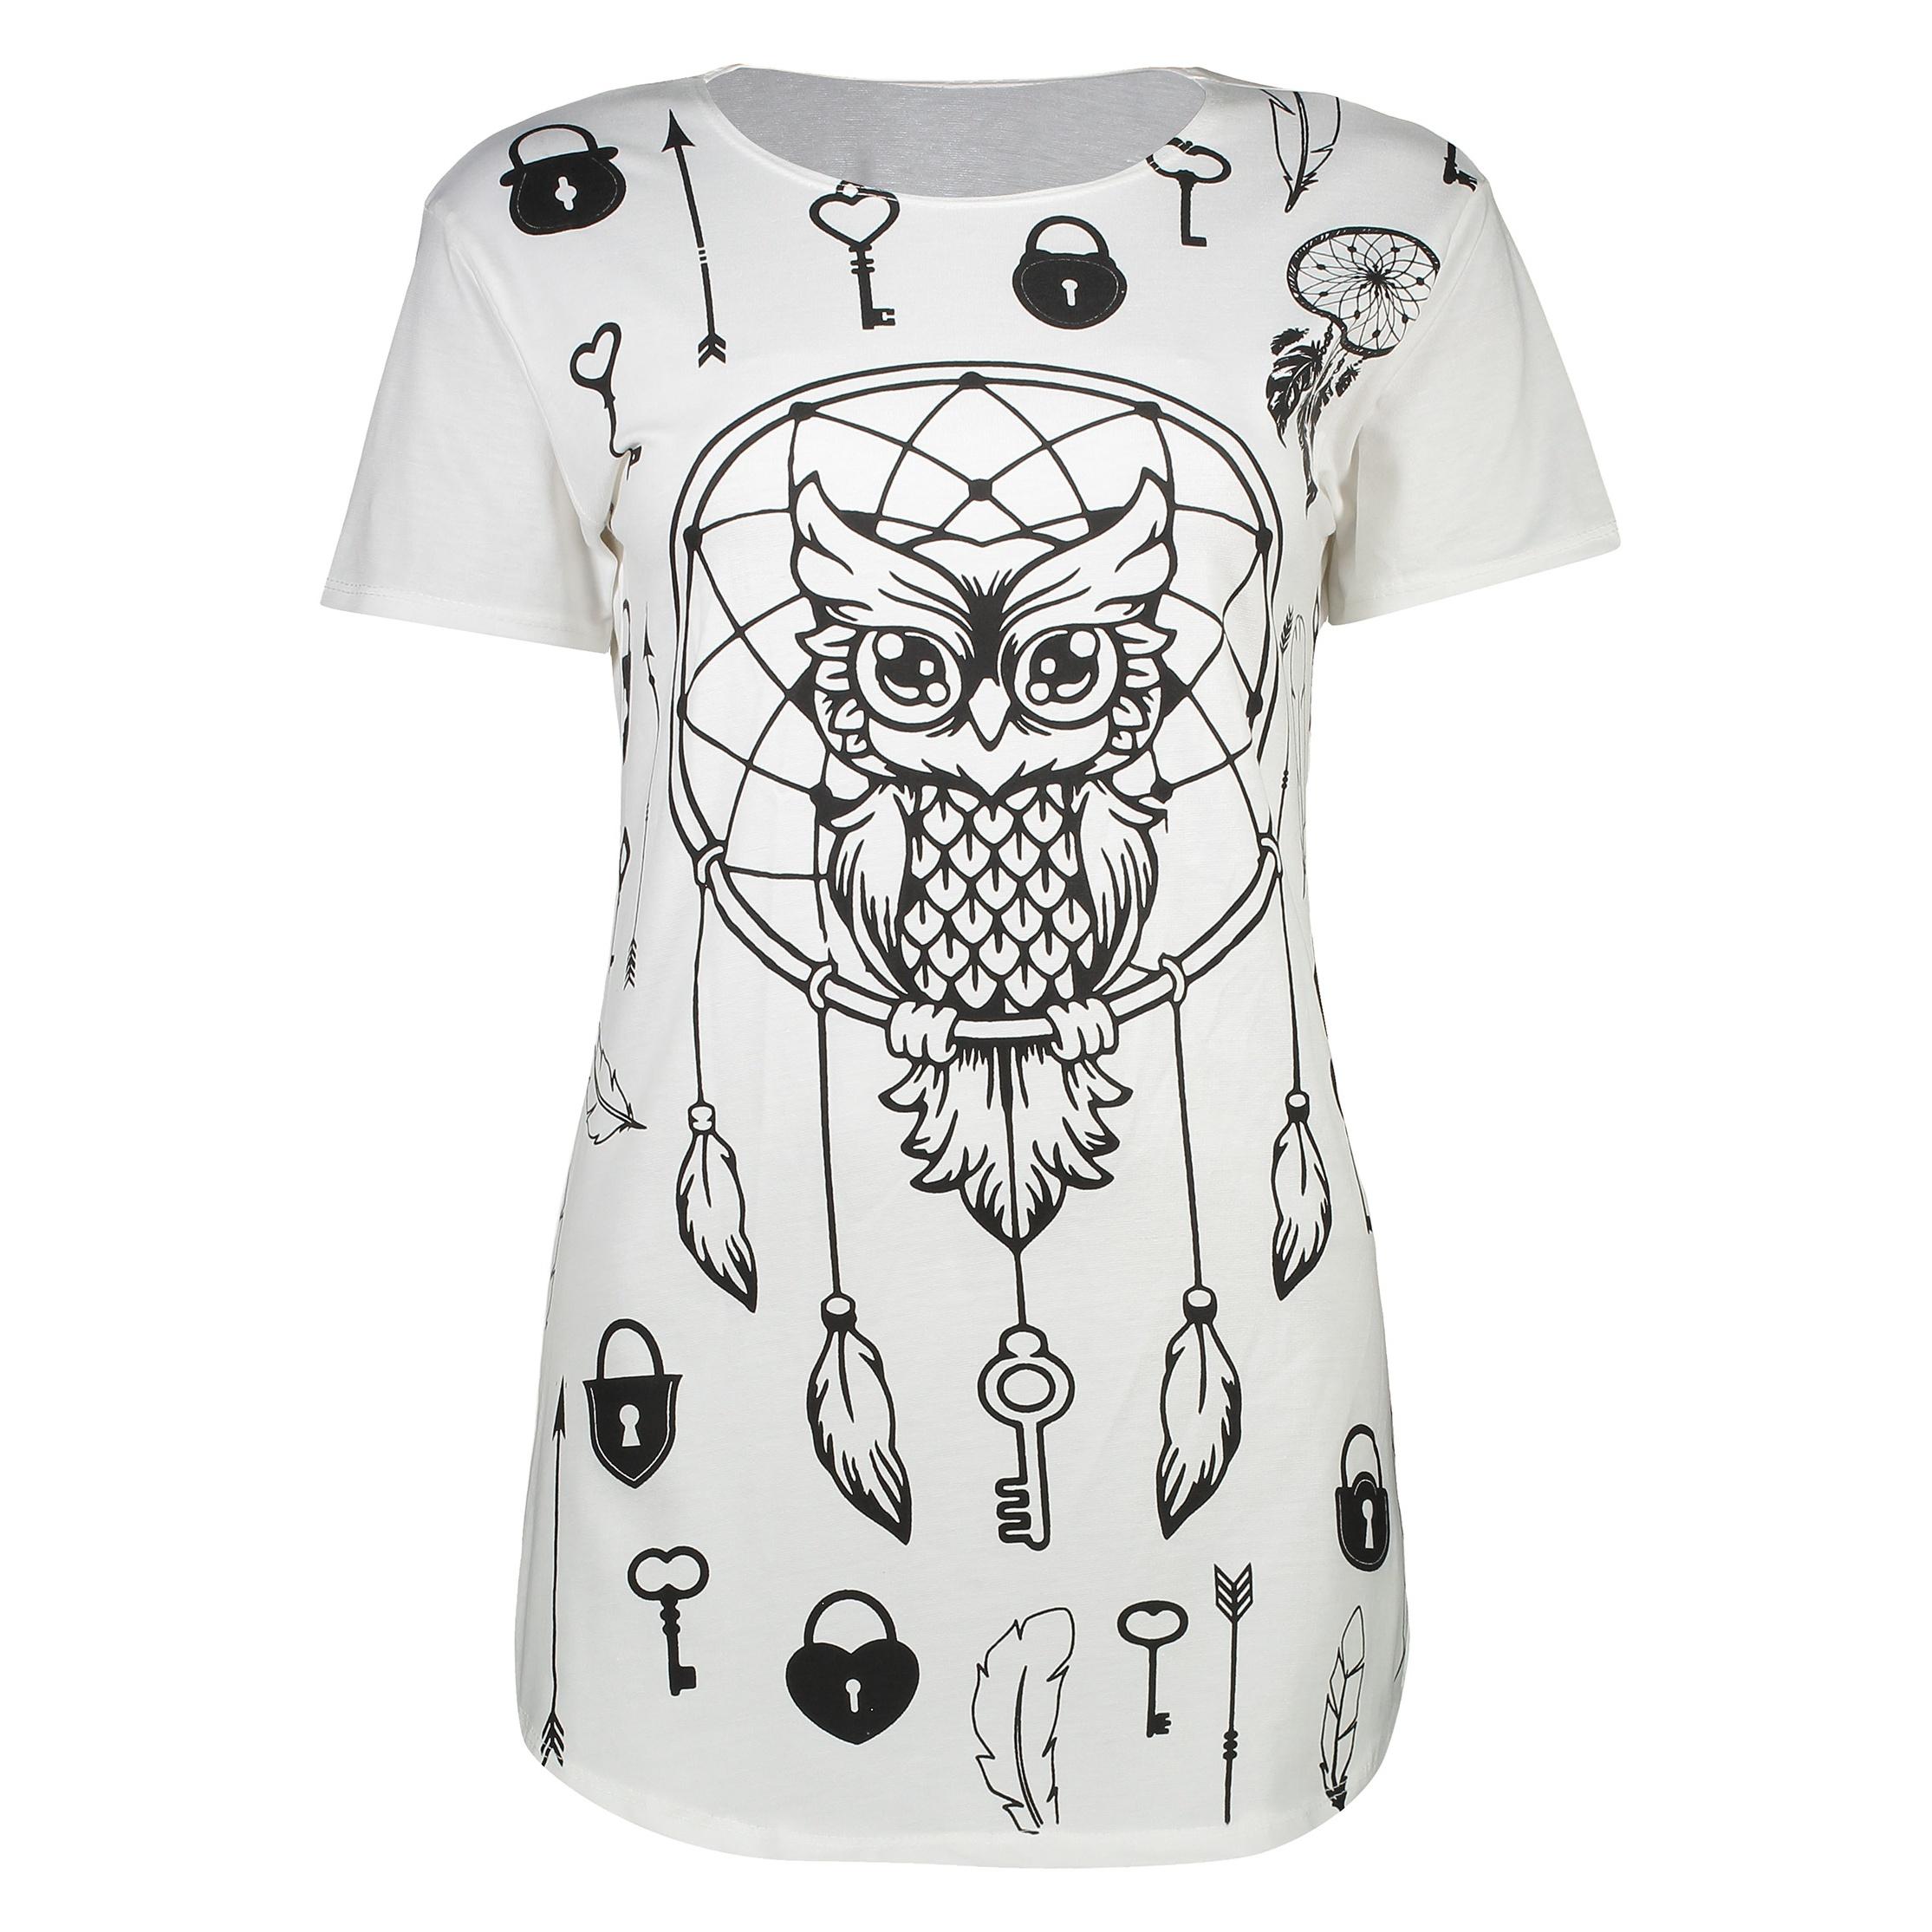 تی شرت زنانه کد ۳۴۹-۴۳۳